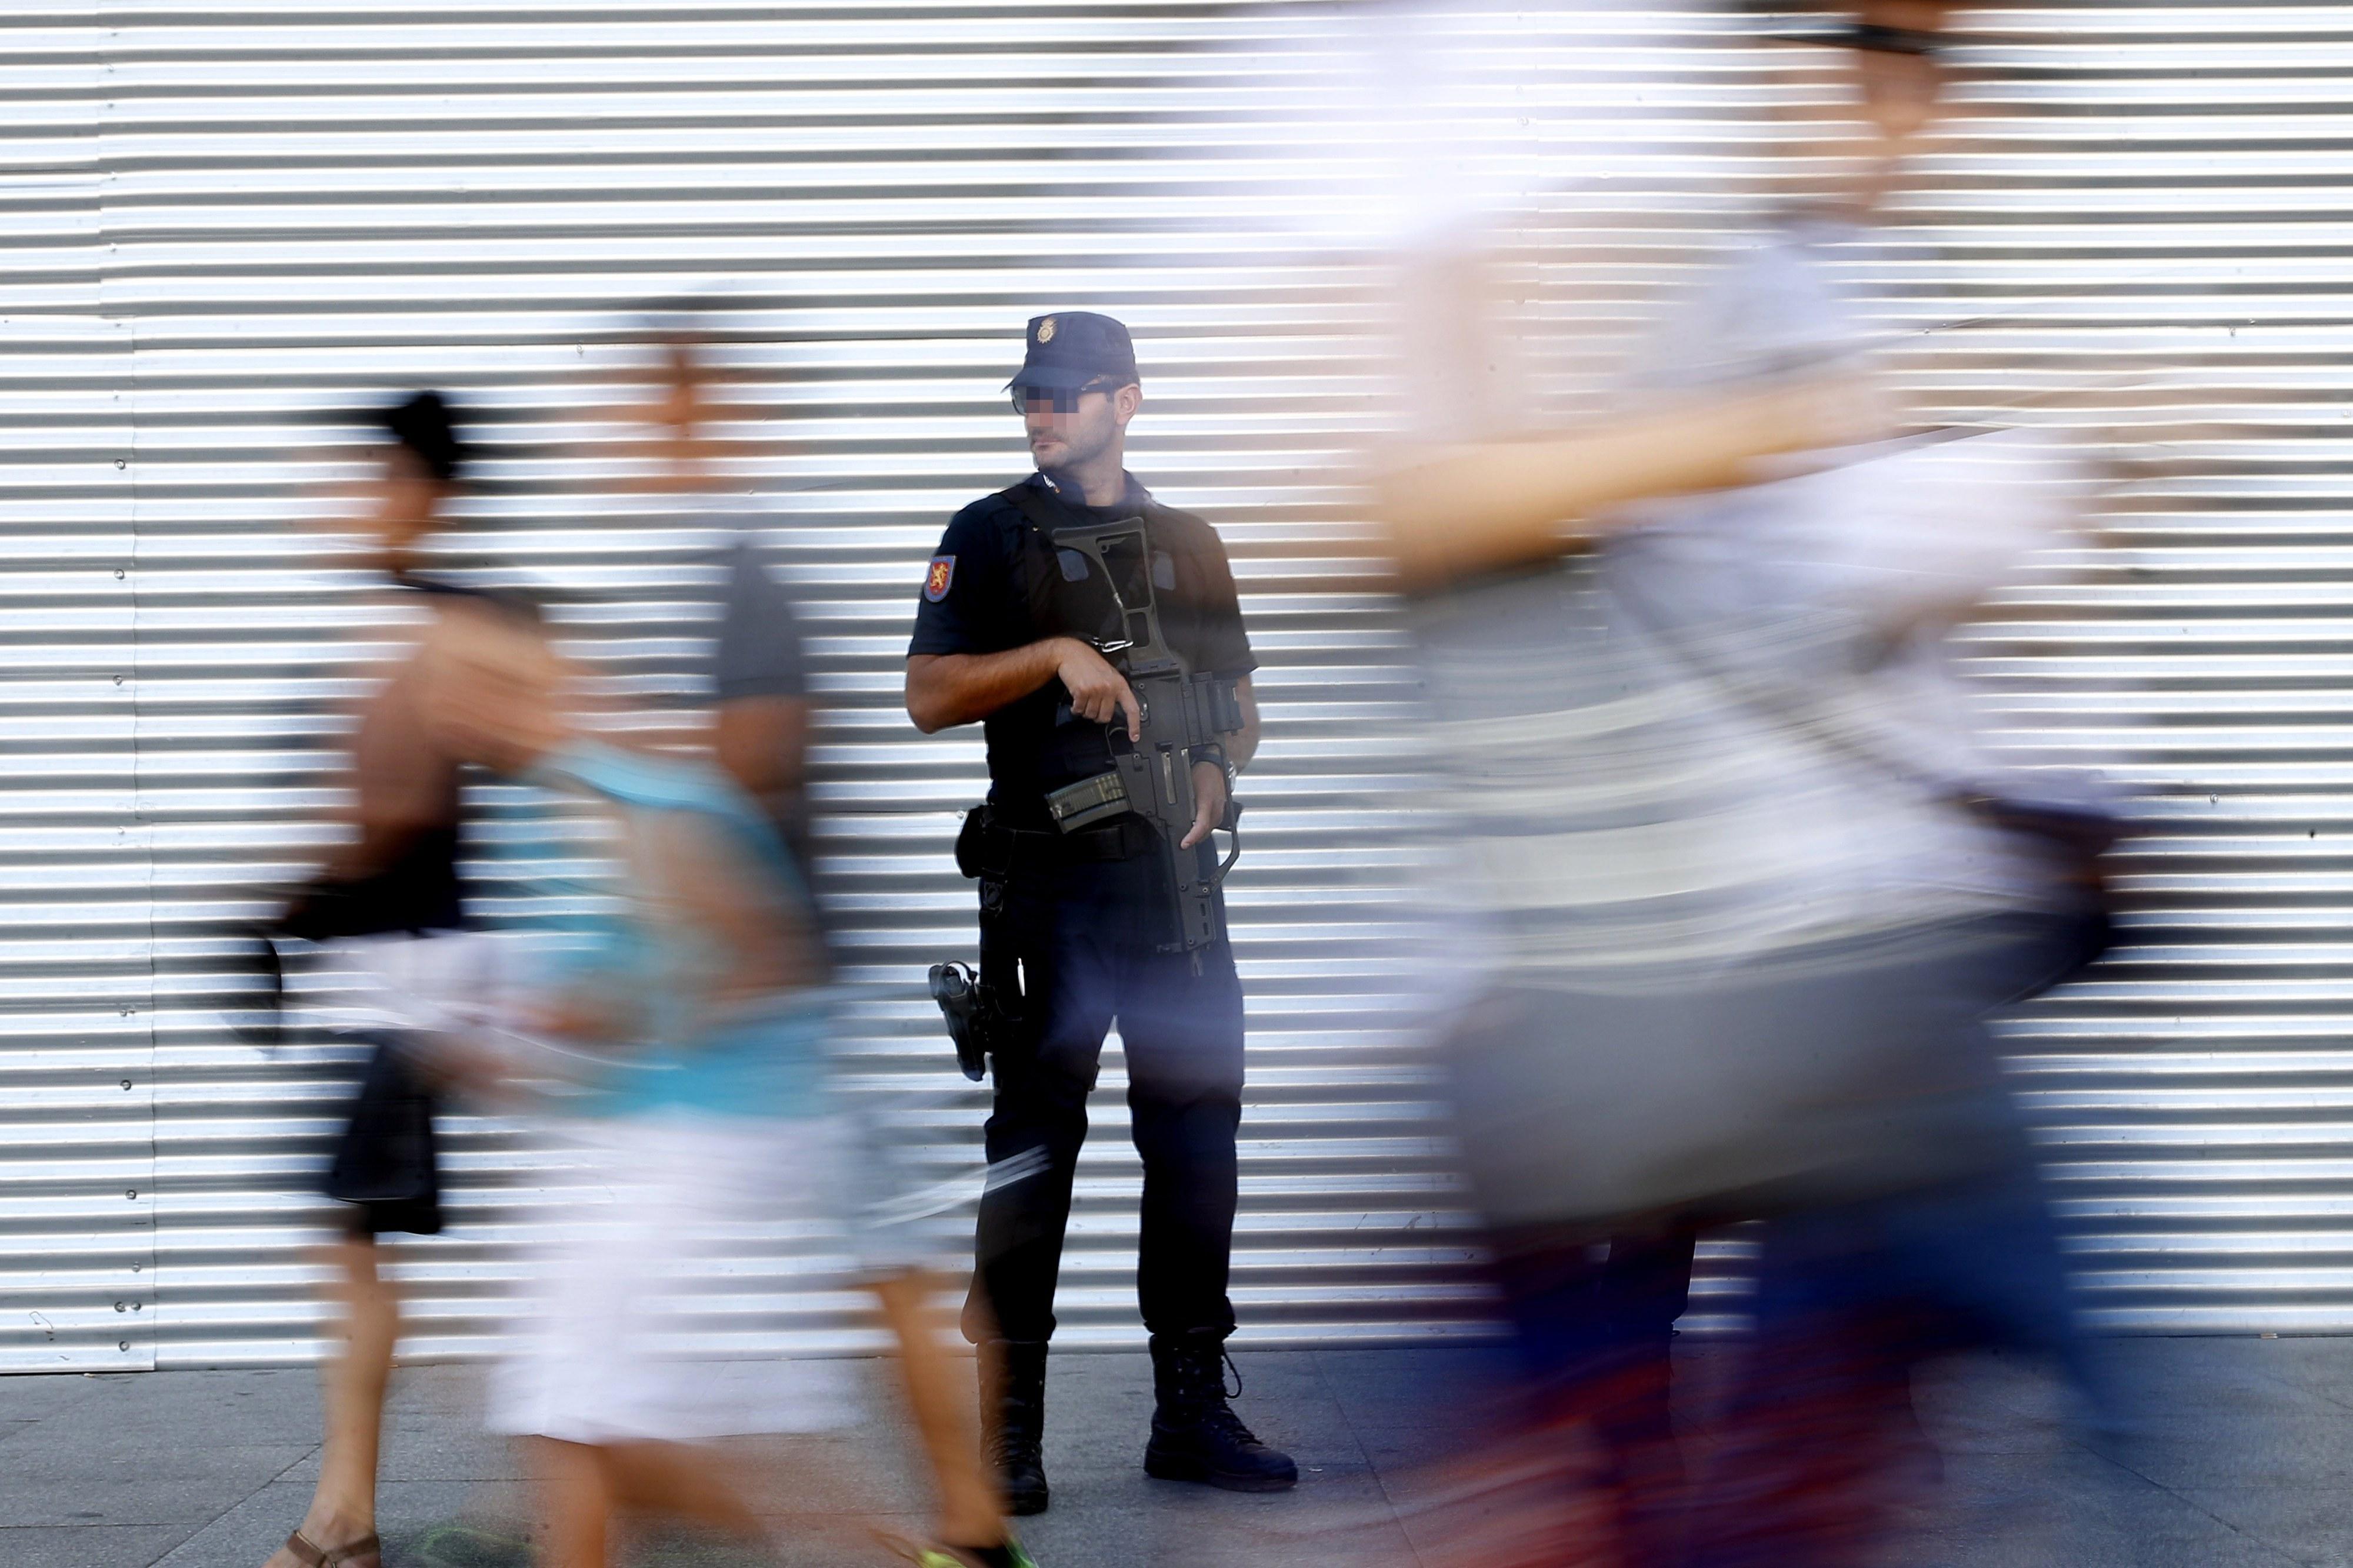 Atentado em Barcelona: buscas por Younes Abouyaaqoub alargadas a toda a Europa